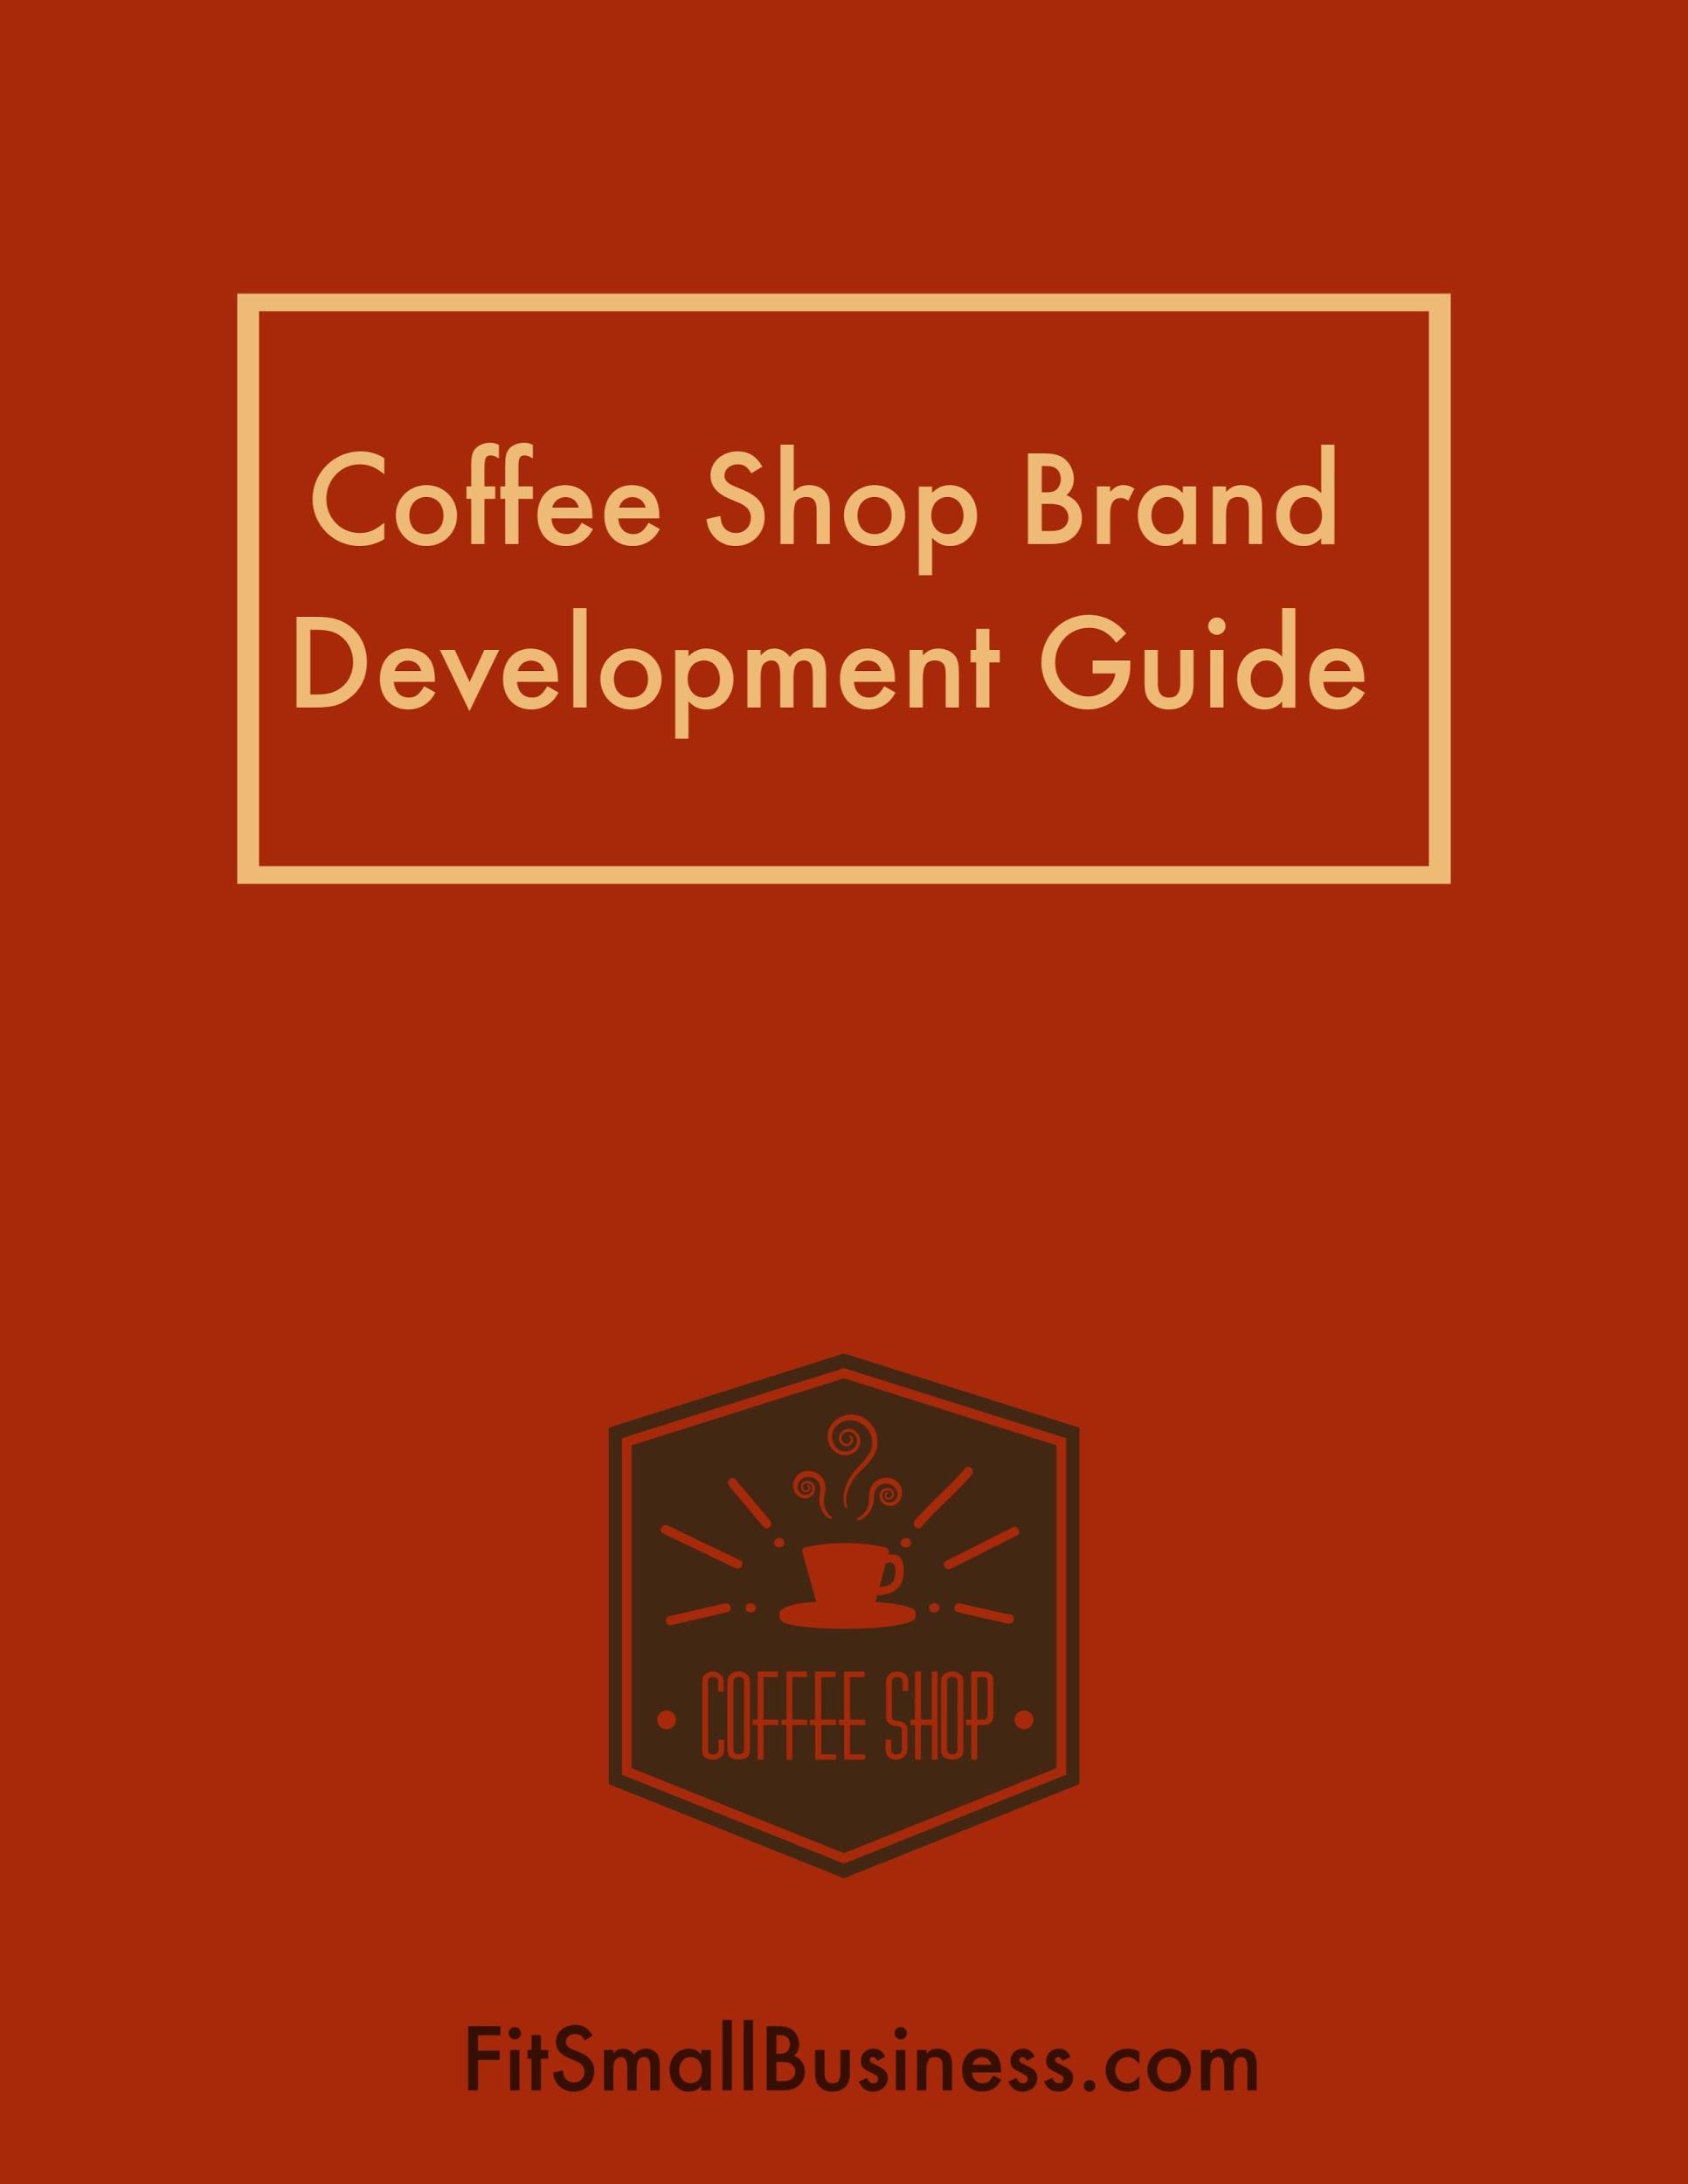 Coffee Shop Brand Development Guide